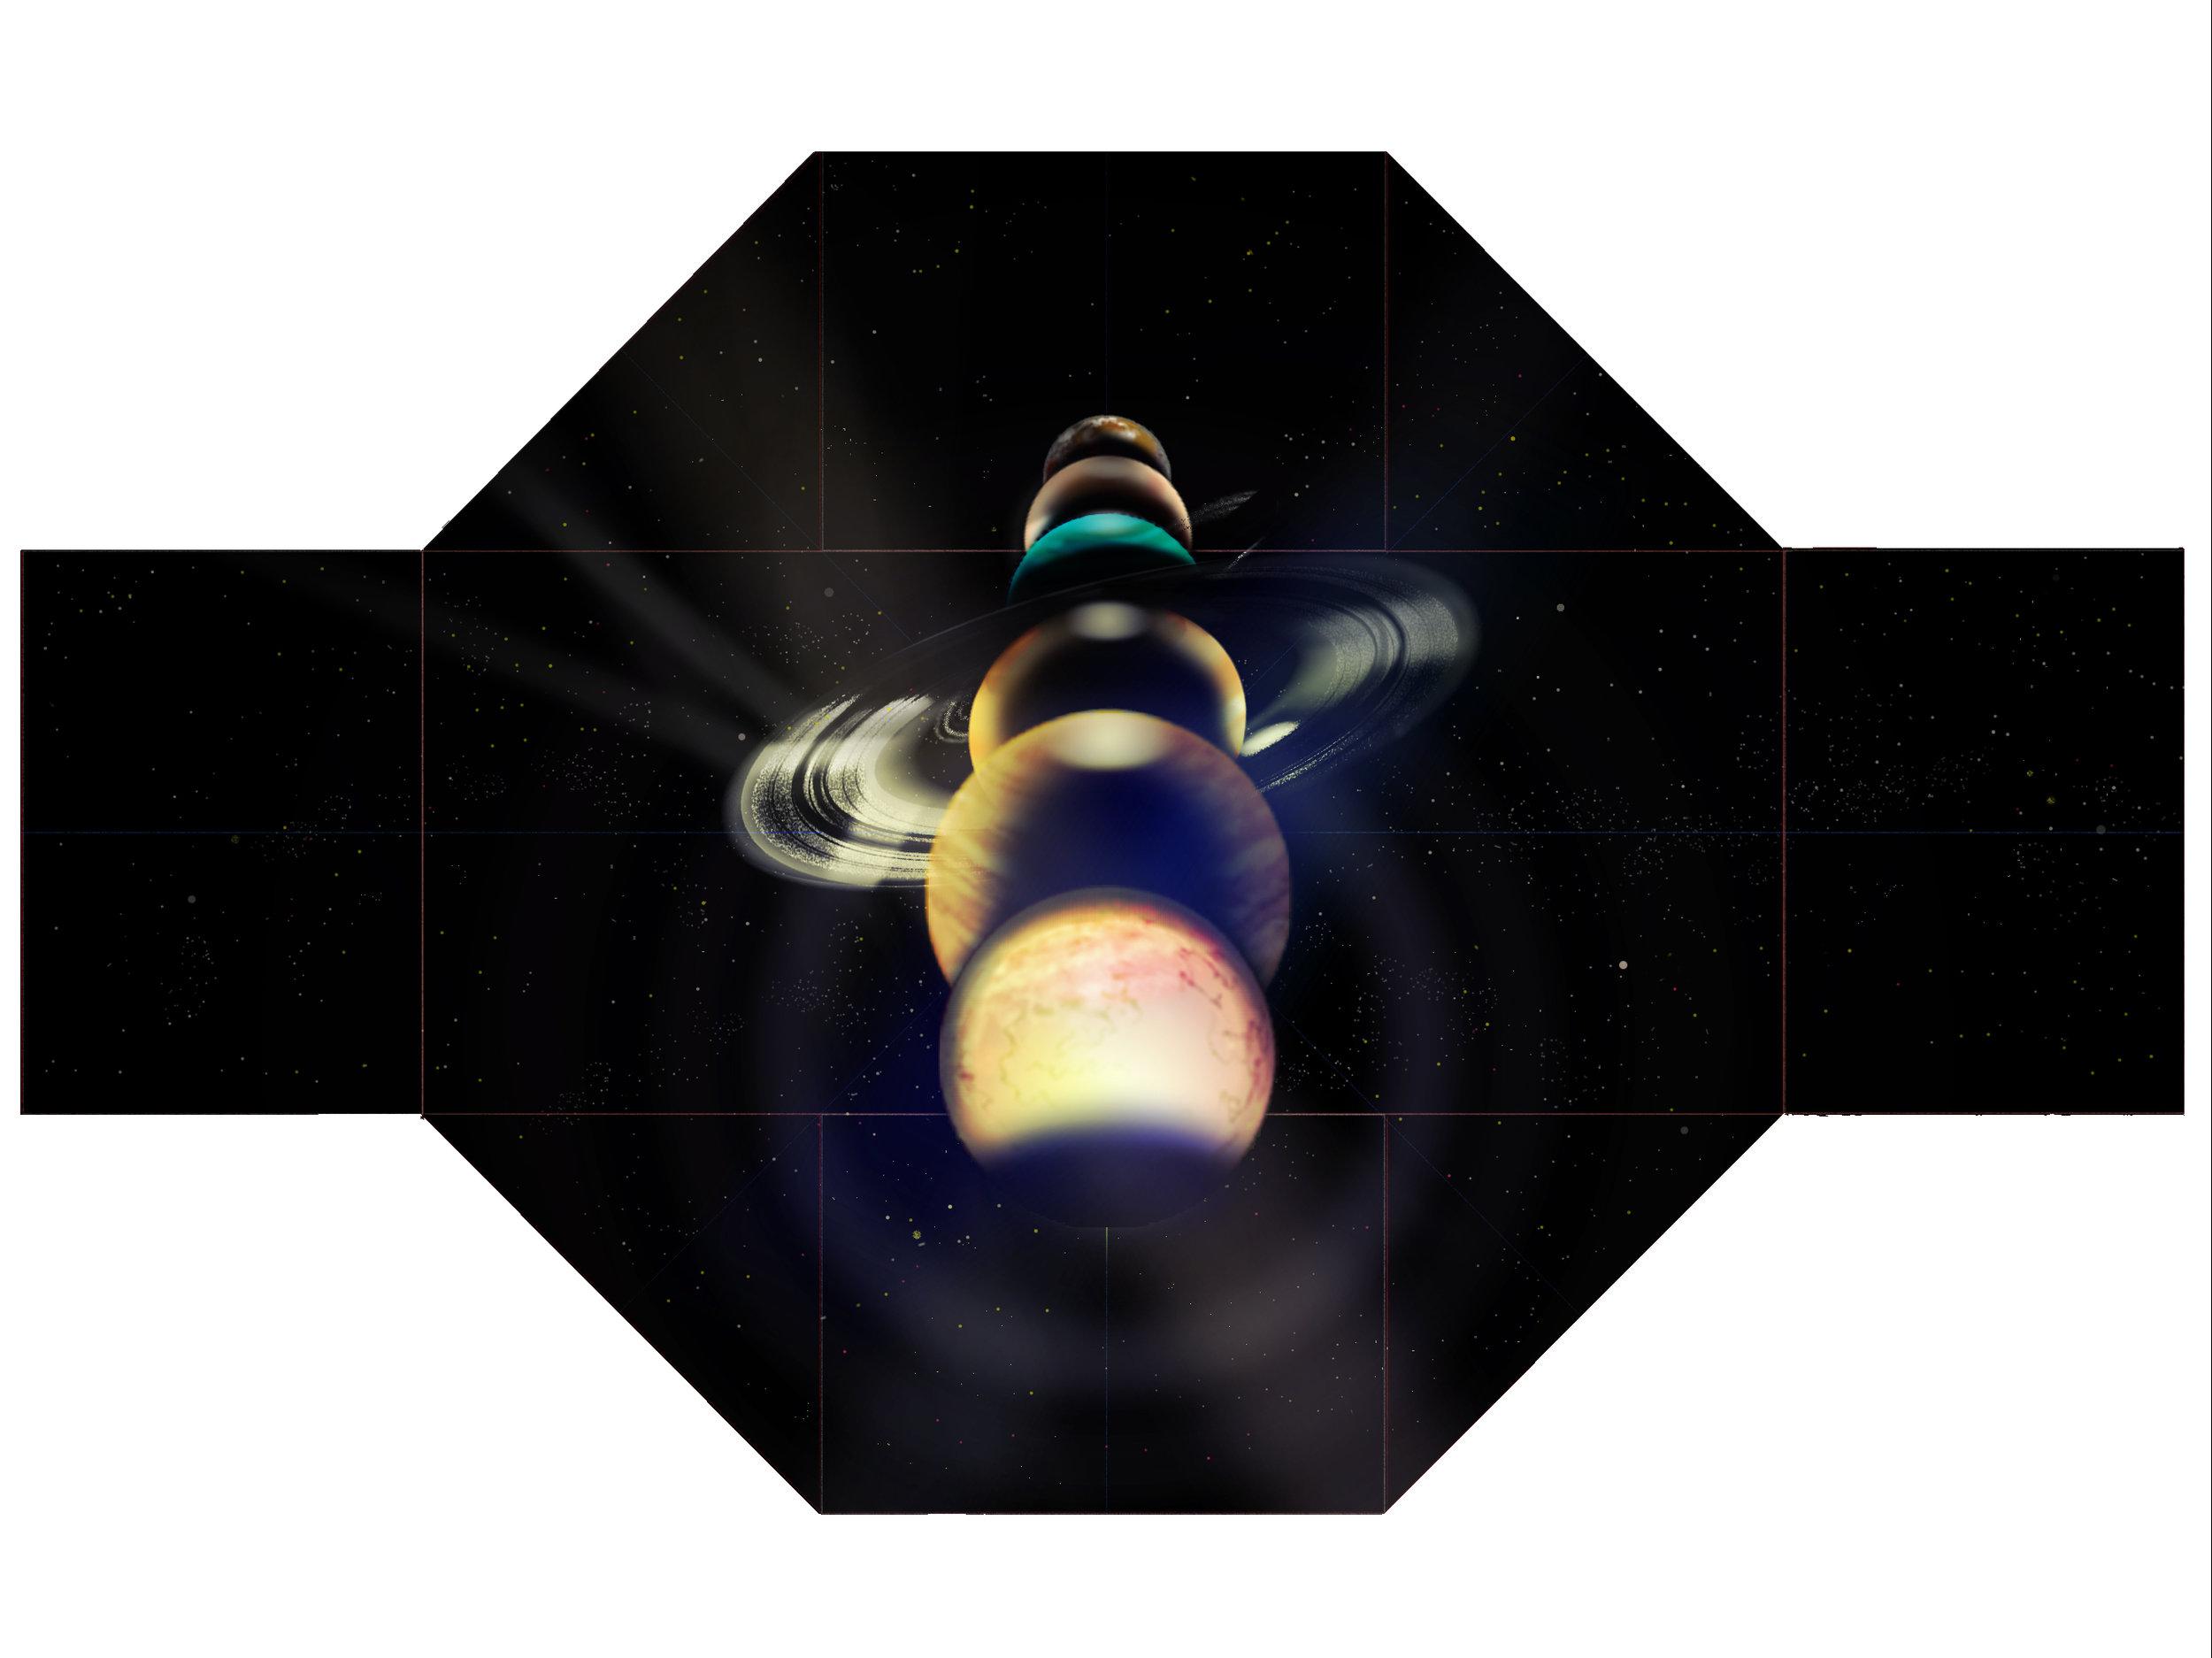 CaseStudySpheres_19.jpg